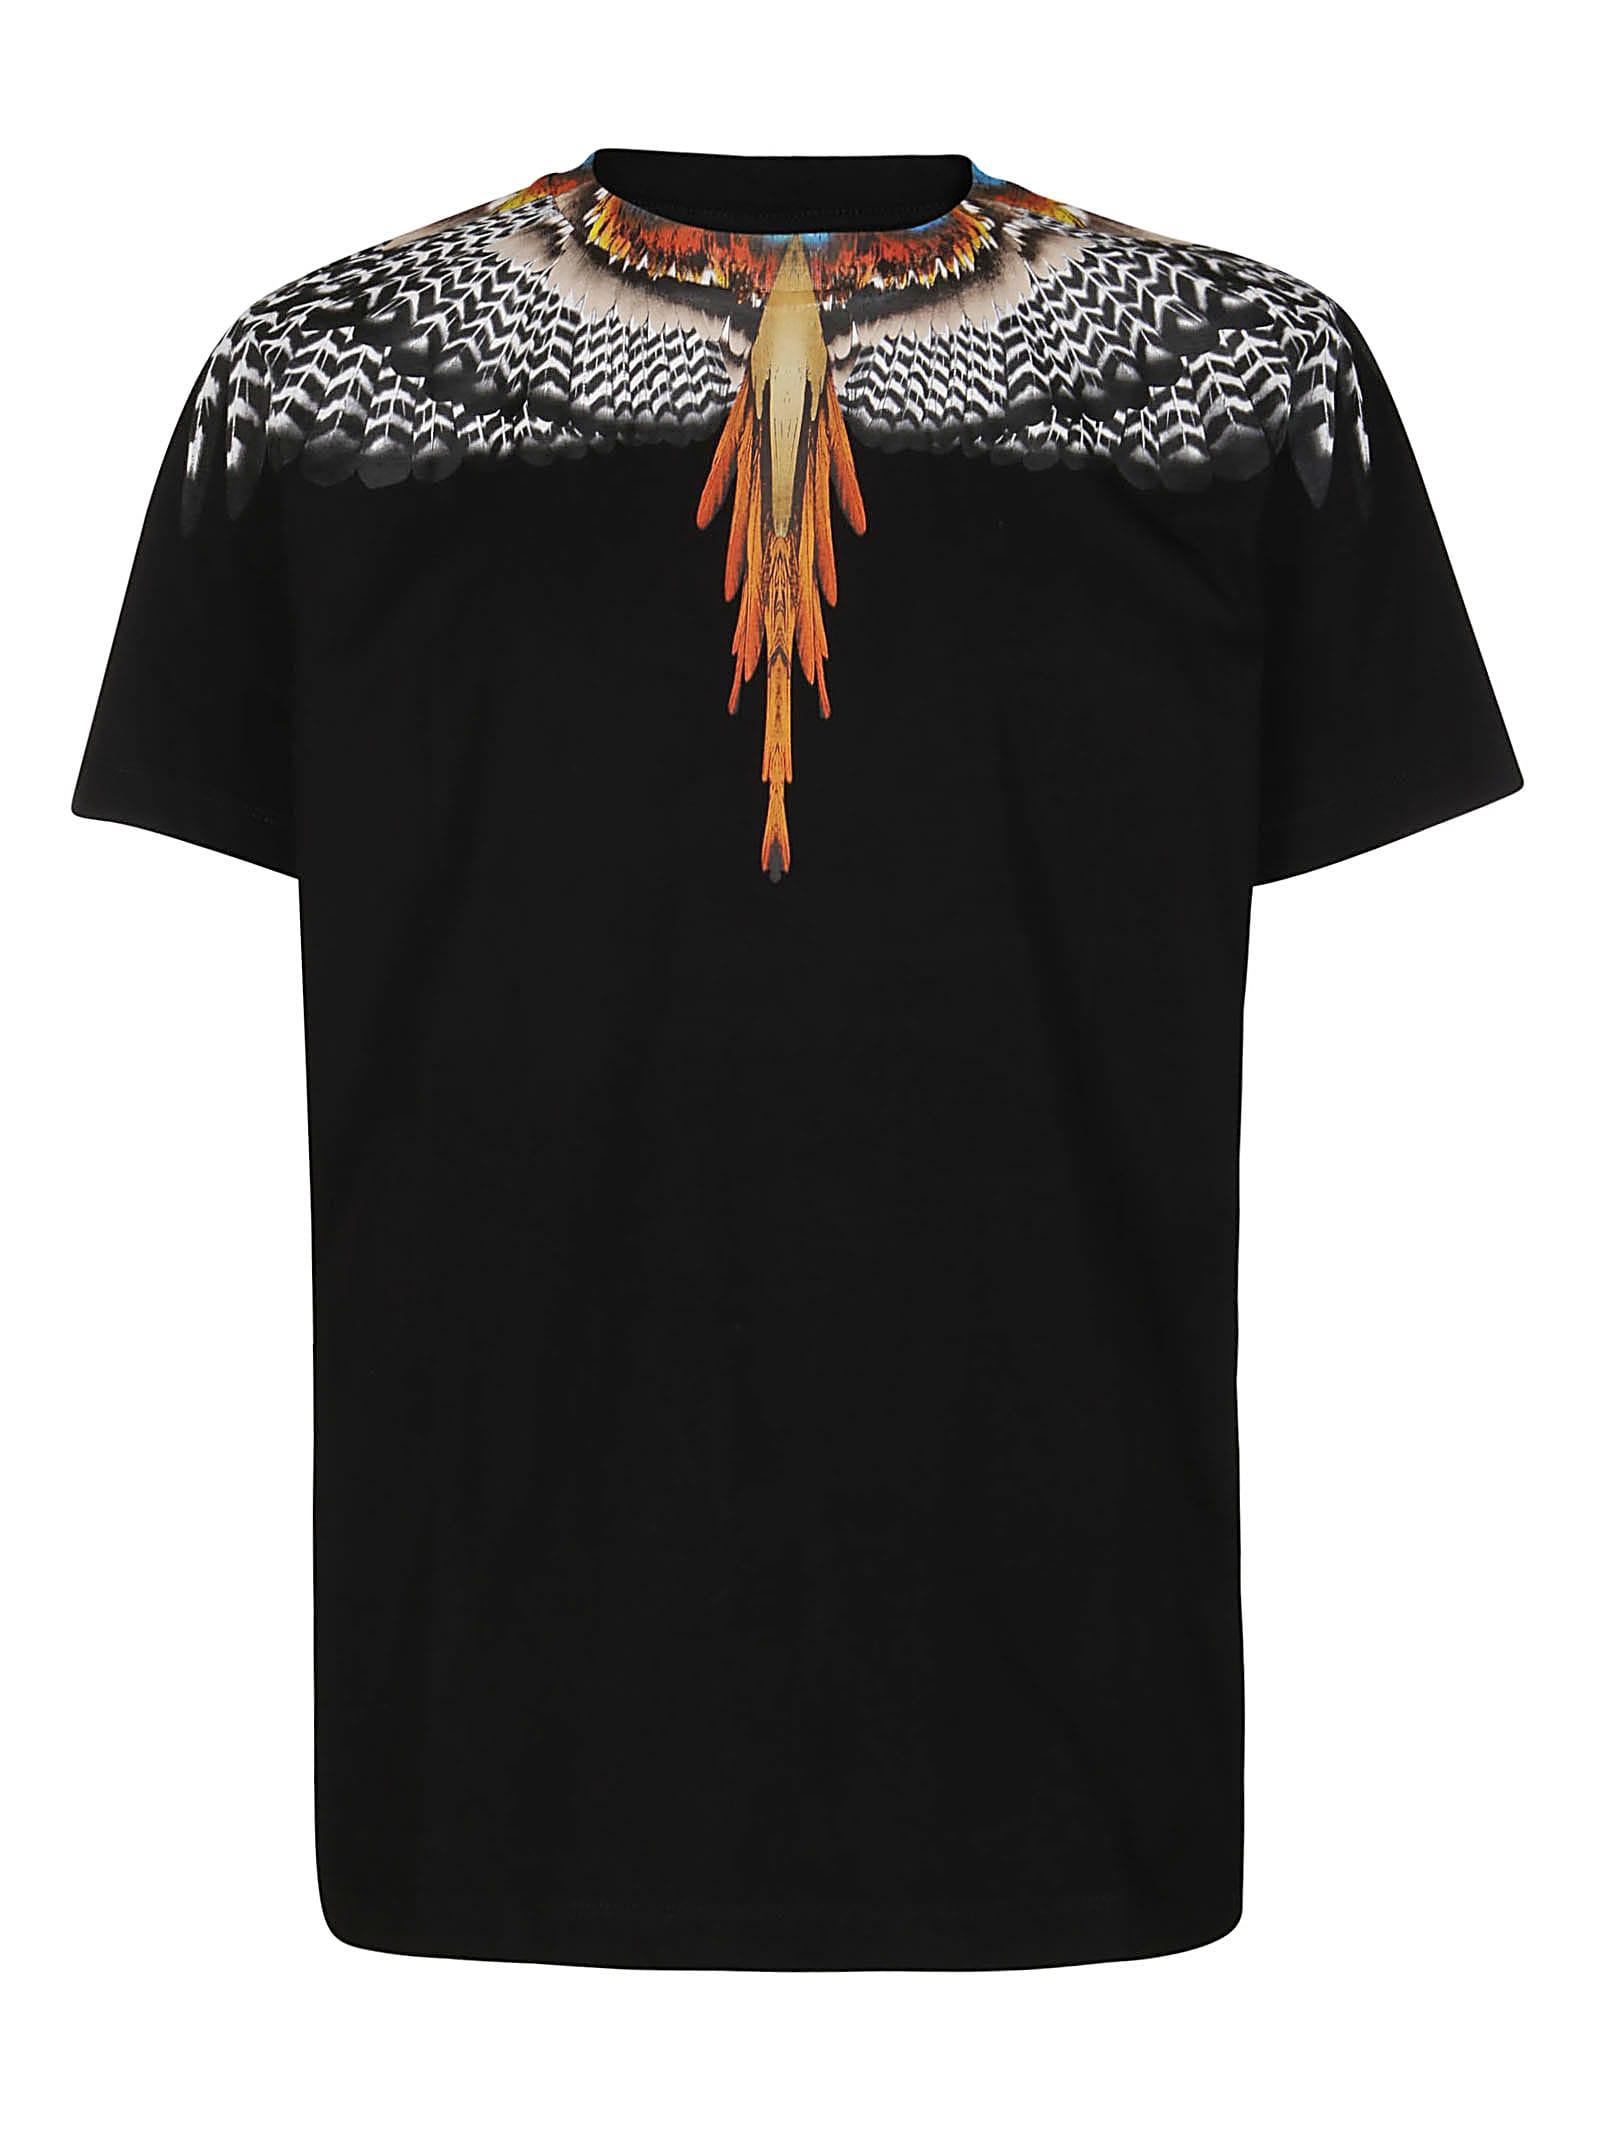 Marcelo Burlon County Of Milan Cottons BLACK COTTON WINGS T-SHIRT